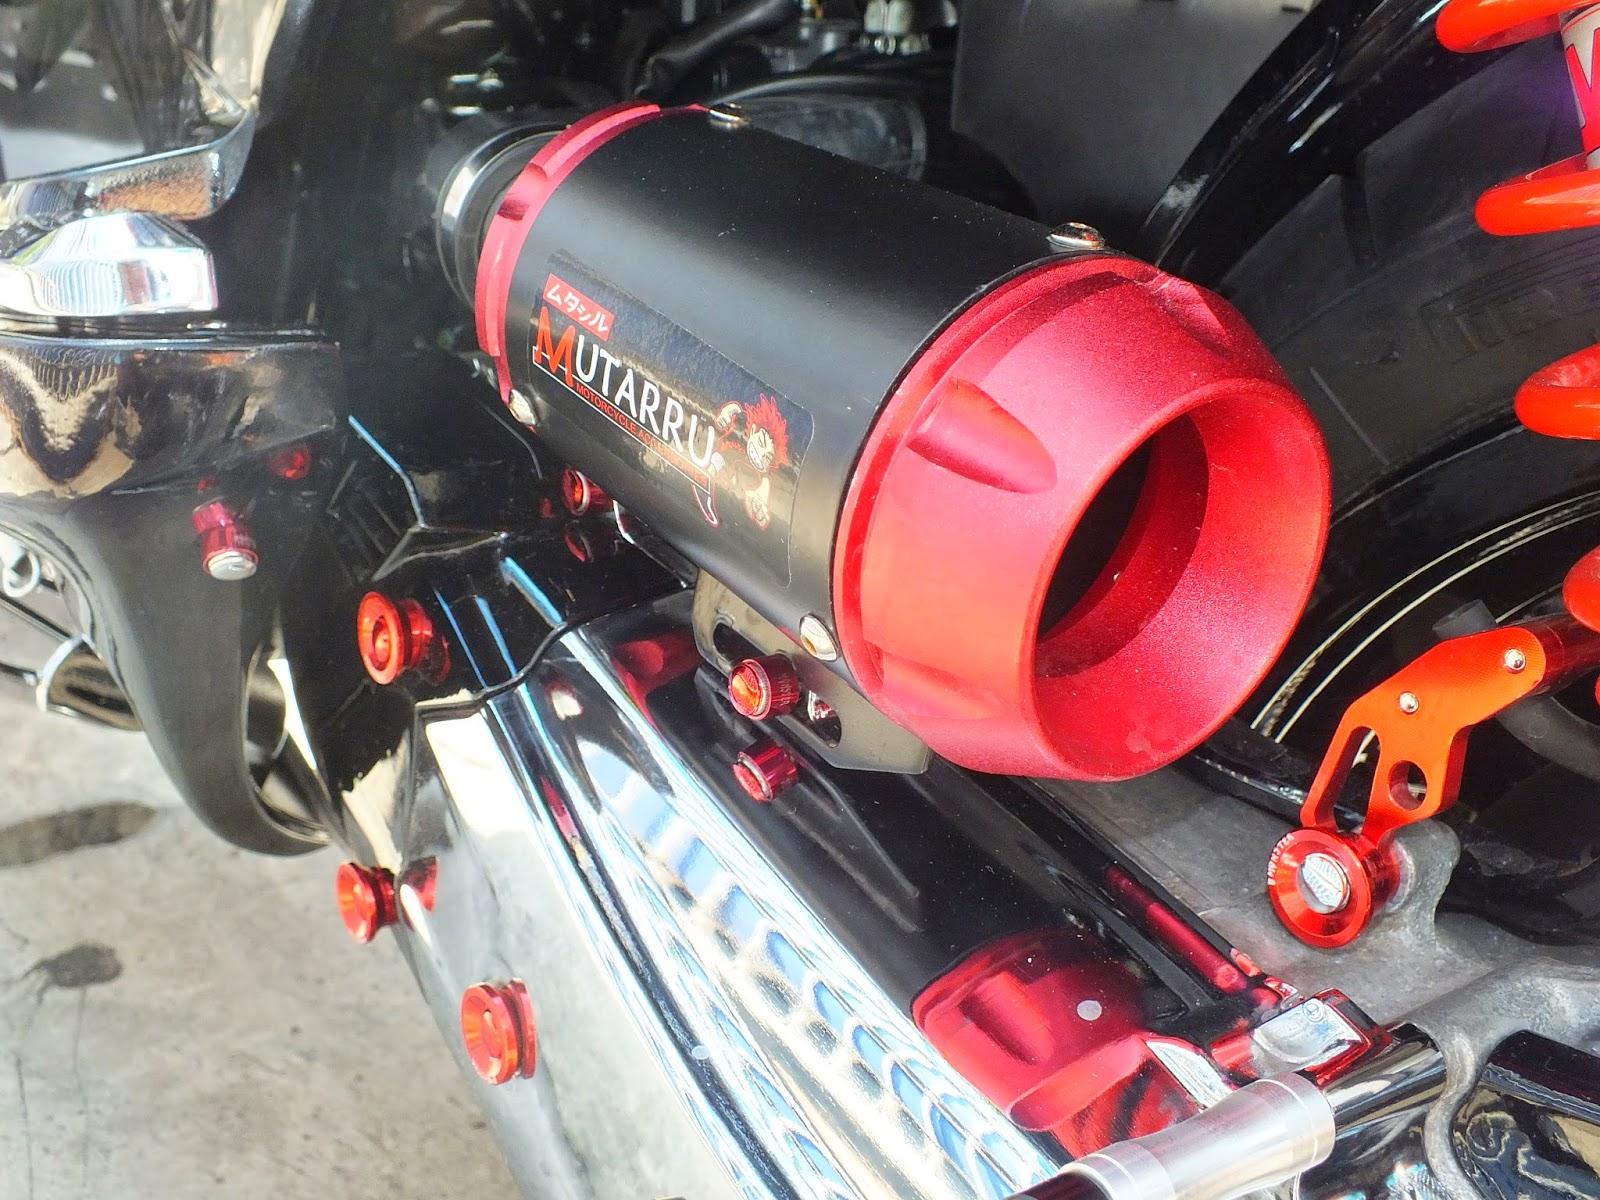 Harga Filter Udara Ferrox Honda Spacy Termurah 2018 Pcx 150 Pgm Fi 88 Modifikasi Motor Matic Terupdate Klepon